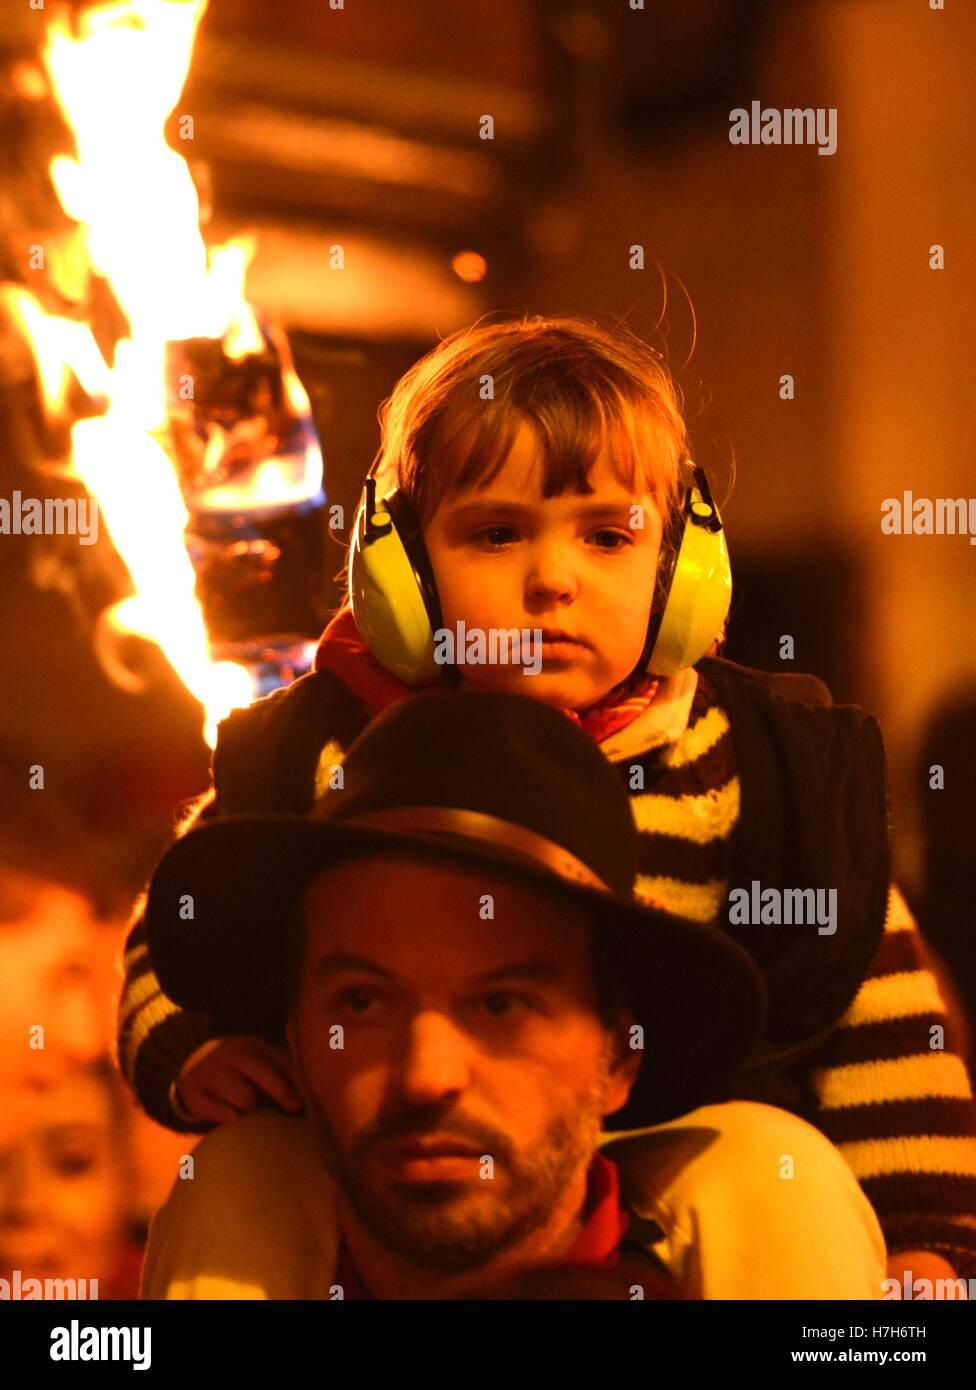 Lewes, East Sussex. 5. November 2016. Lewes feiert seinen berühmten Bonfire Night mit einem dramatischen Fackelzug Stockbild